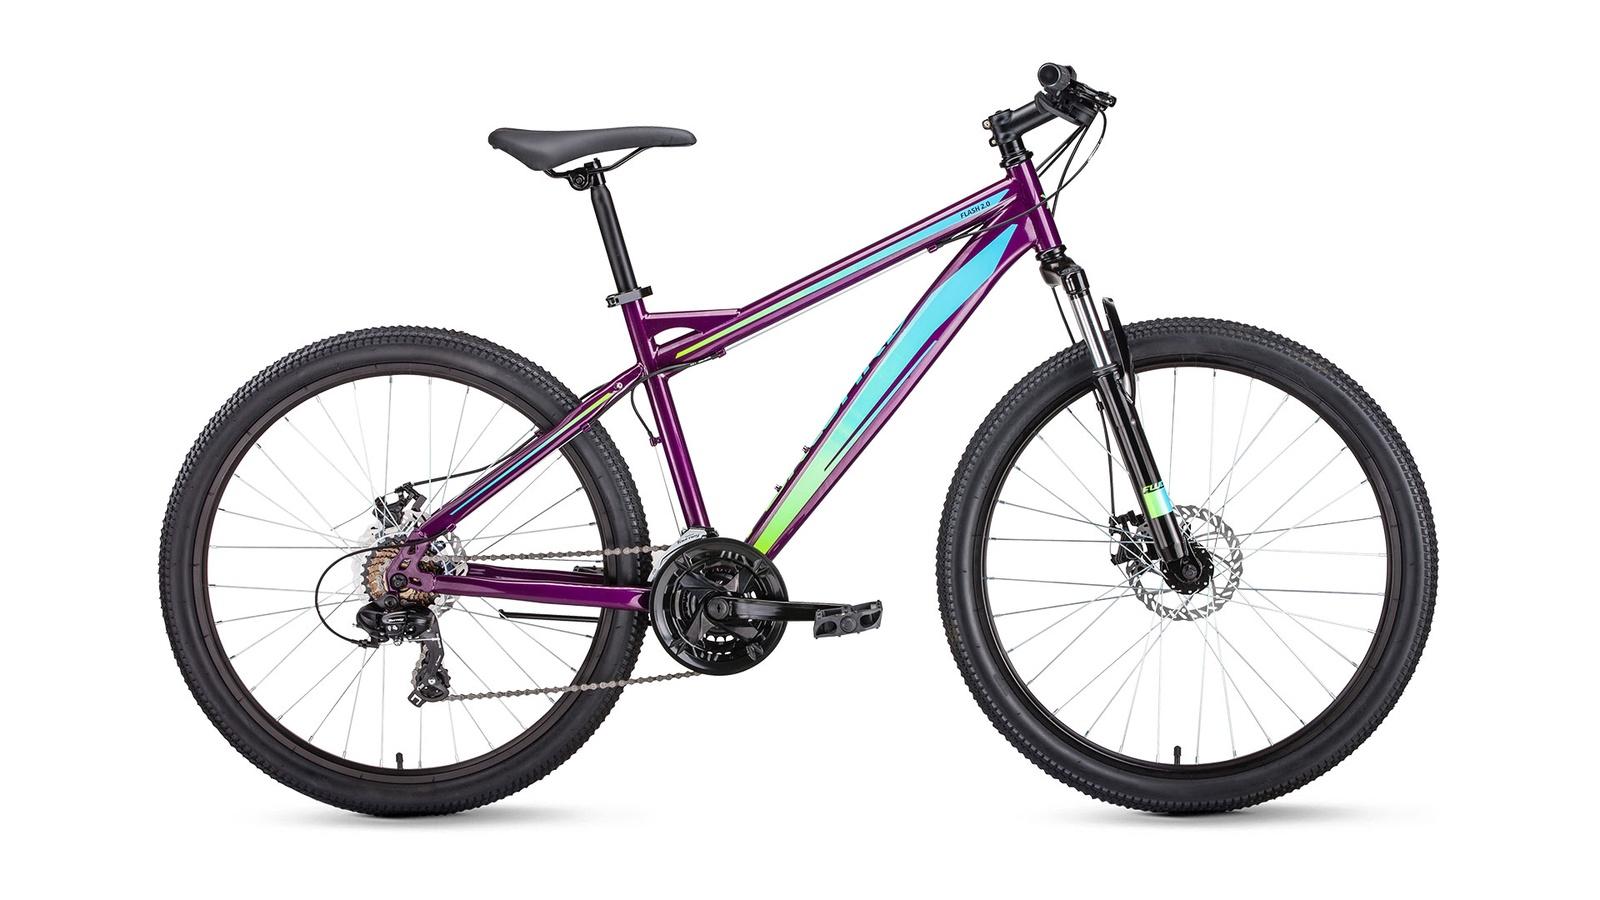 Велосипед Forward Flash, фиолетовый велосипед forward flash 26 2 0 disс 2019